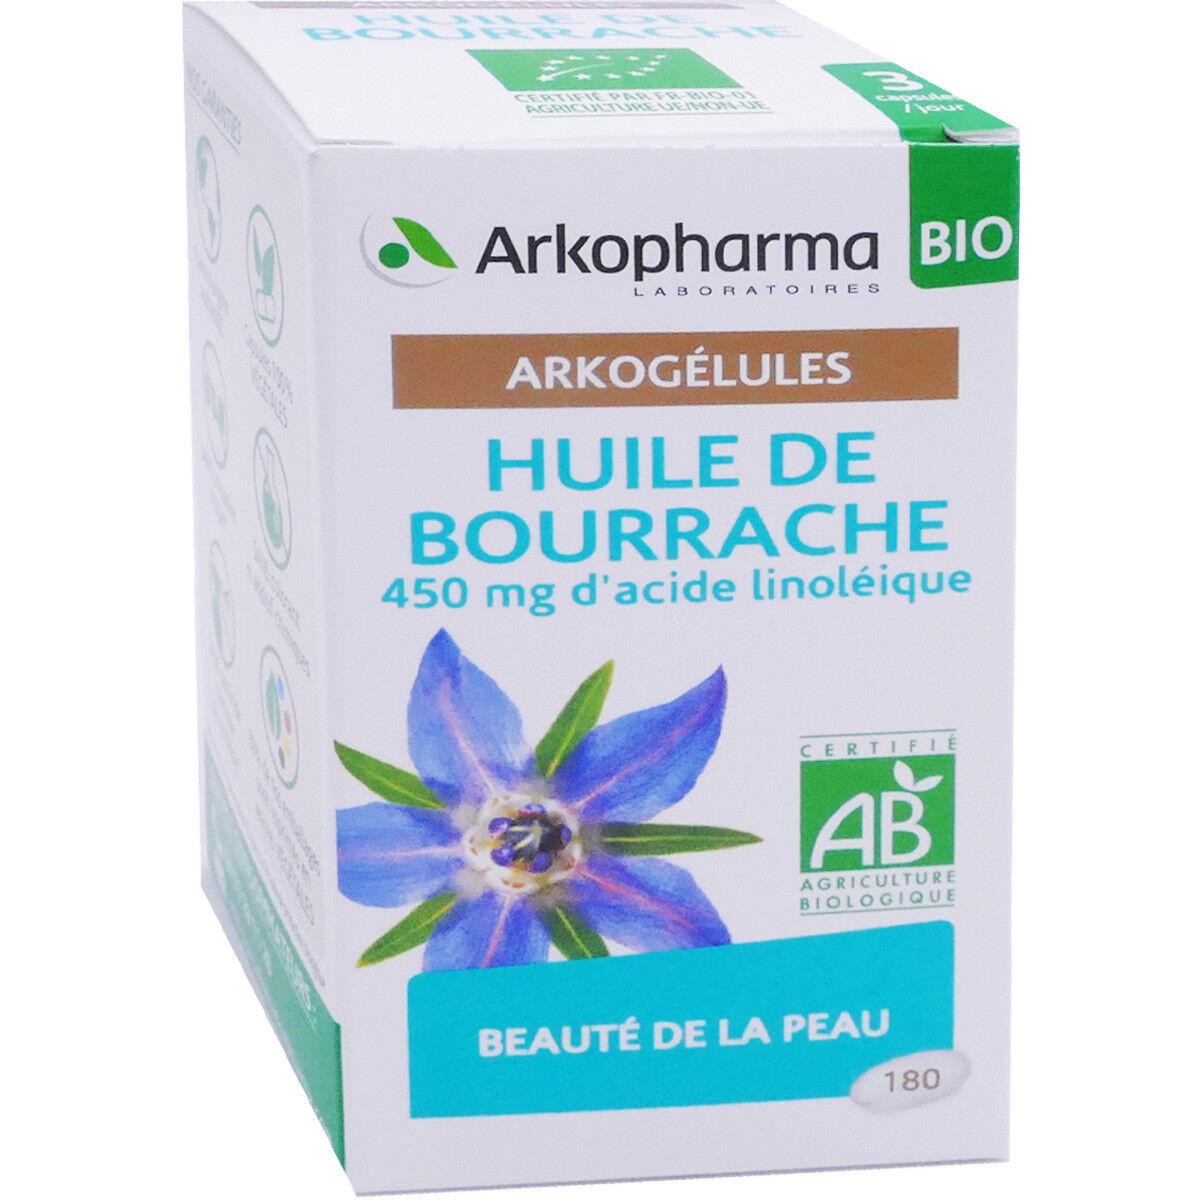 Arkopharma huile de bourrache 180 arkogelules bio